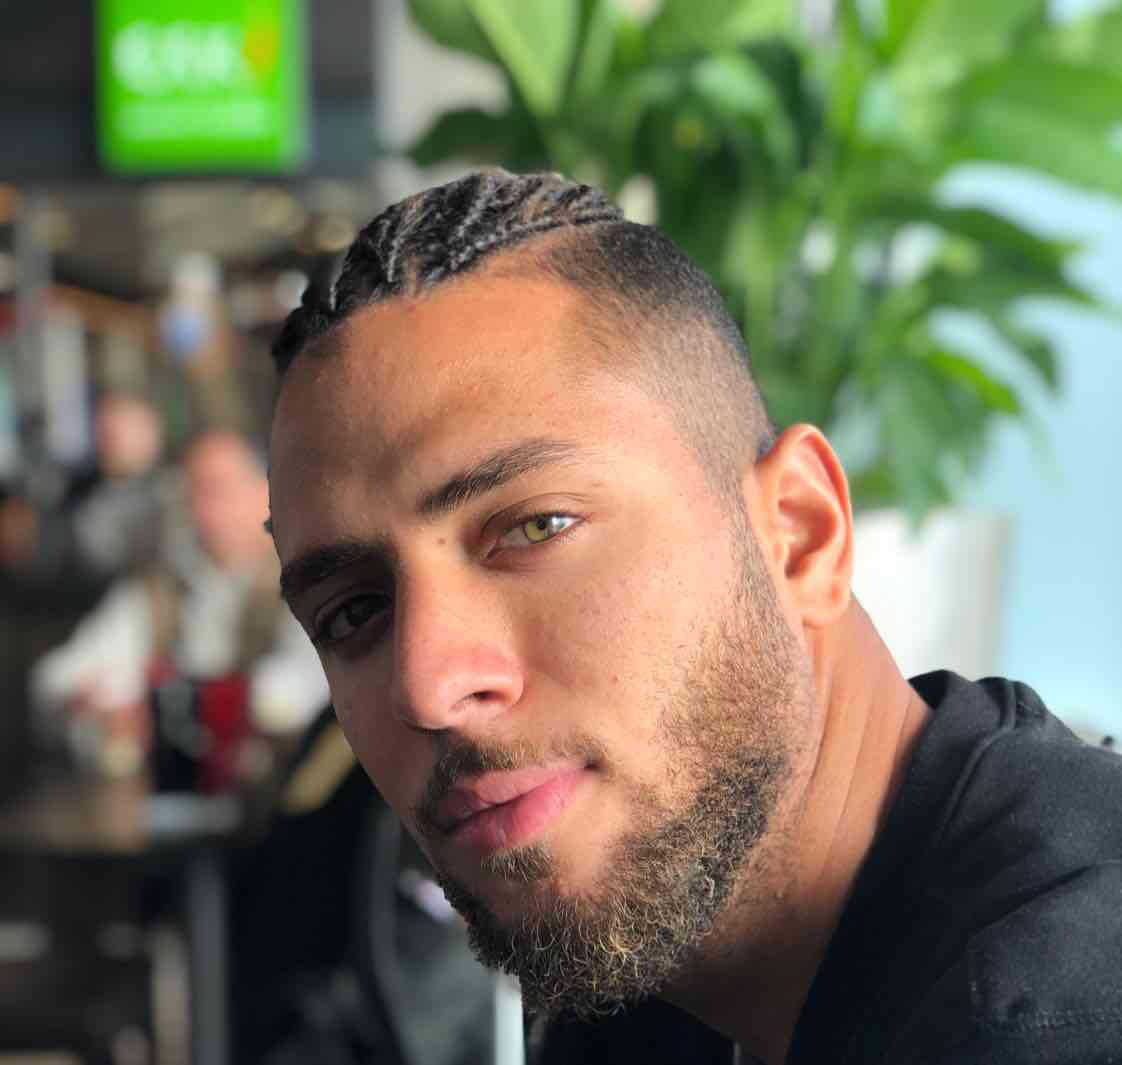 Avatar of Amro Tarek